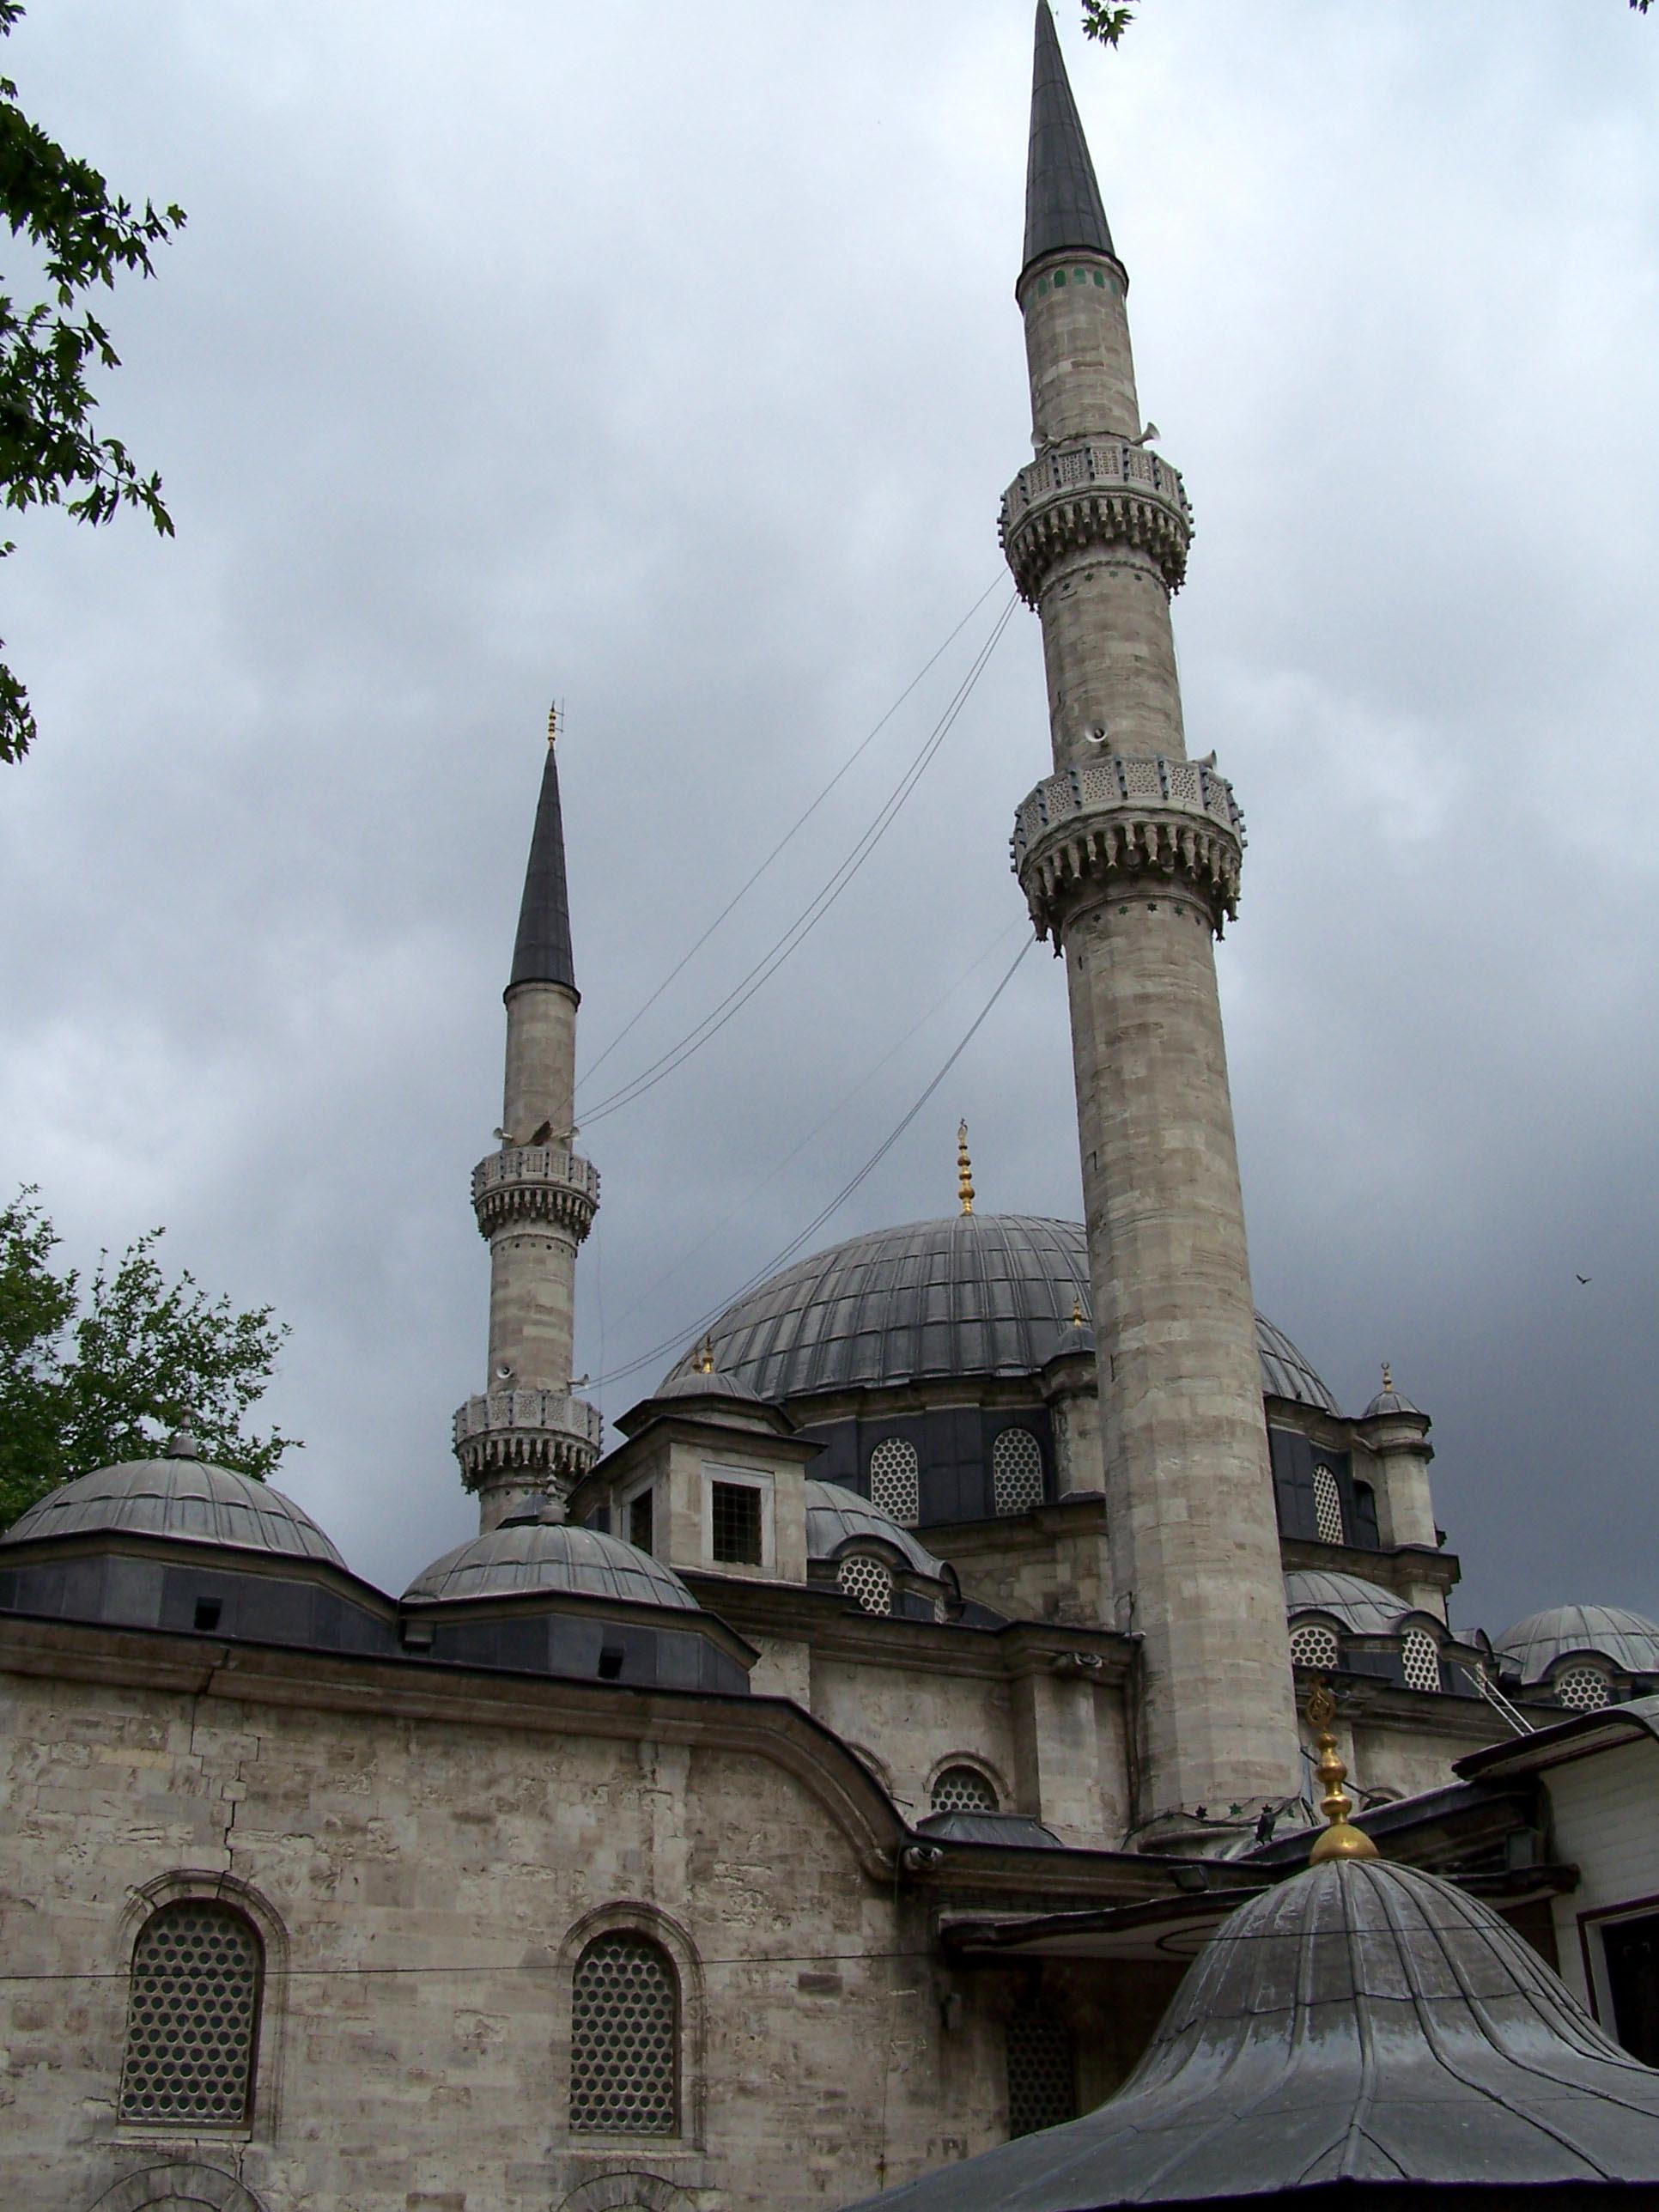 http://upload.wikimedia.org/wikipedia/commons/e/eb/%C4%B0stanbul_5999.jpg